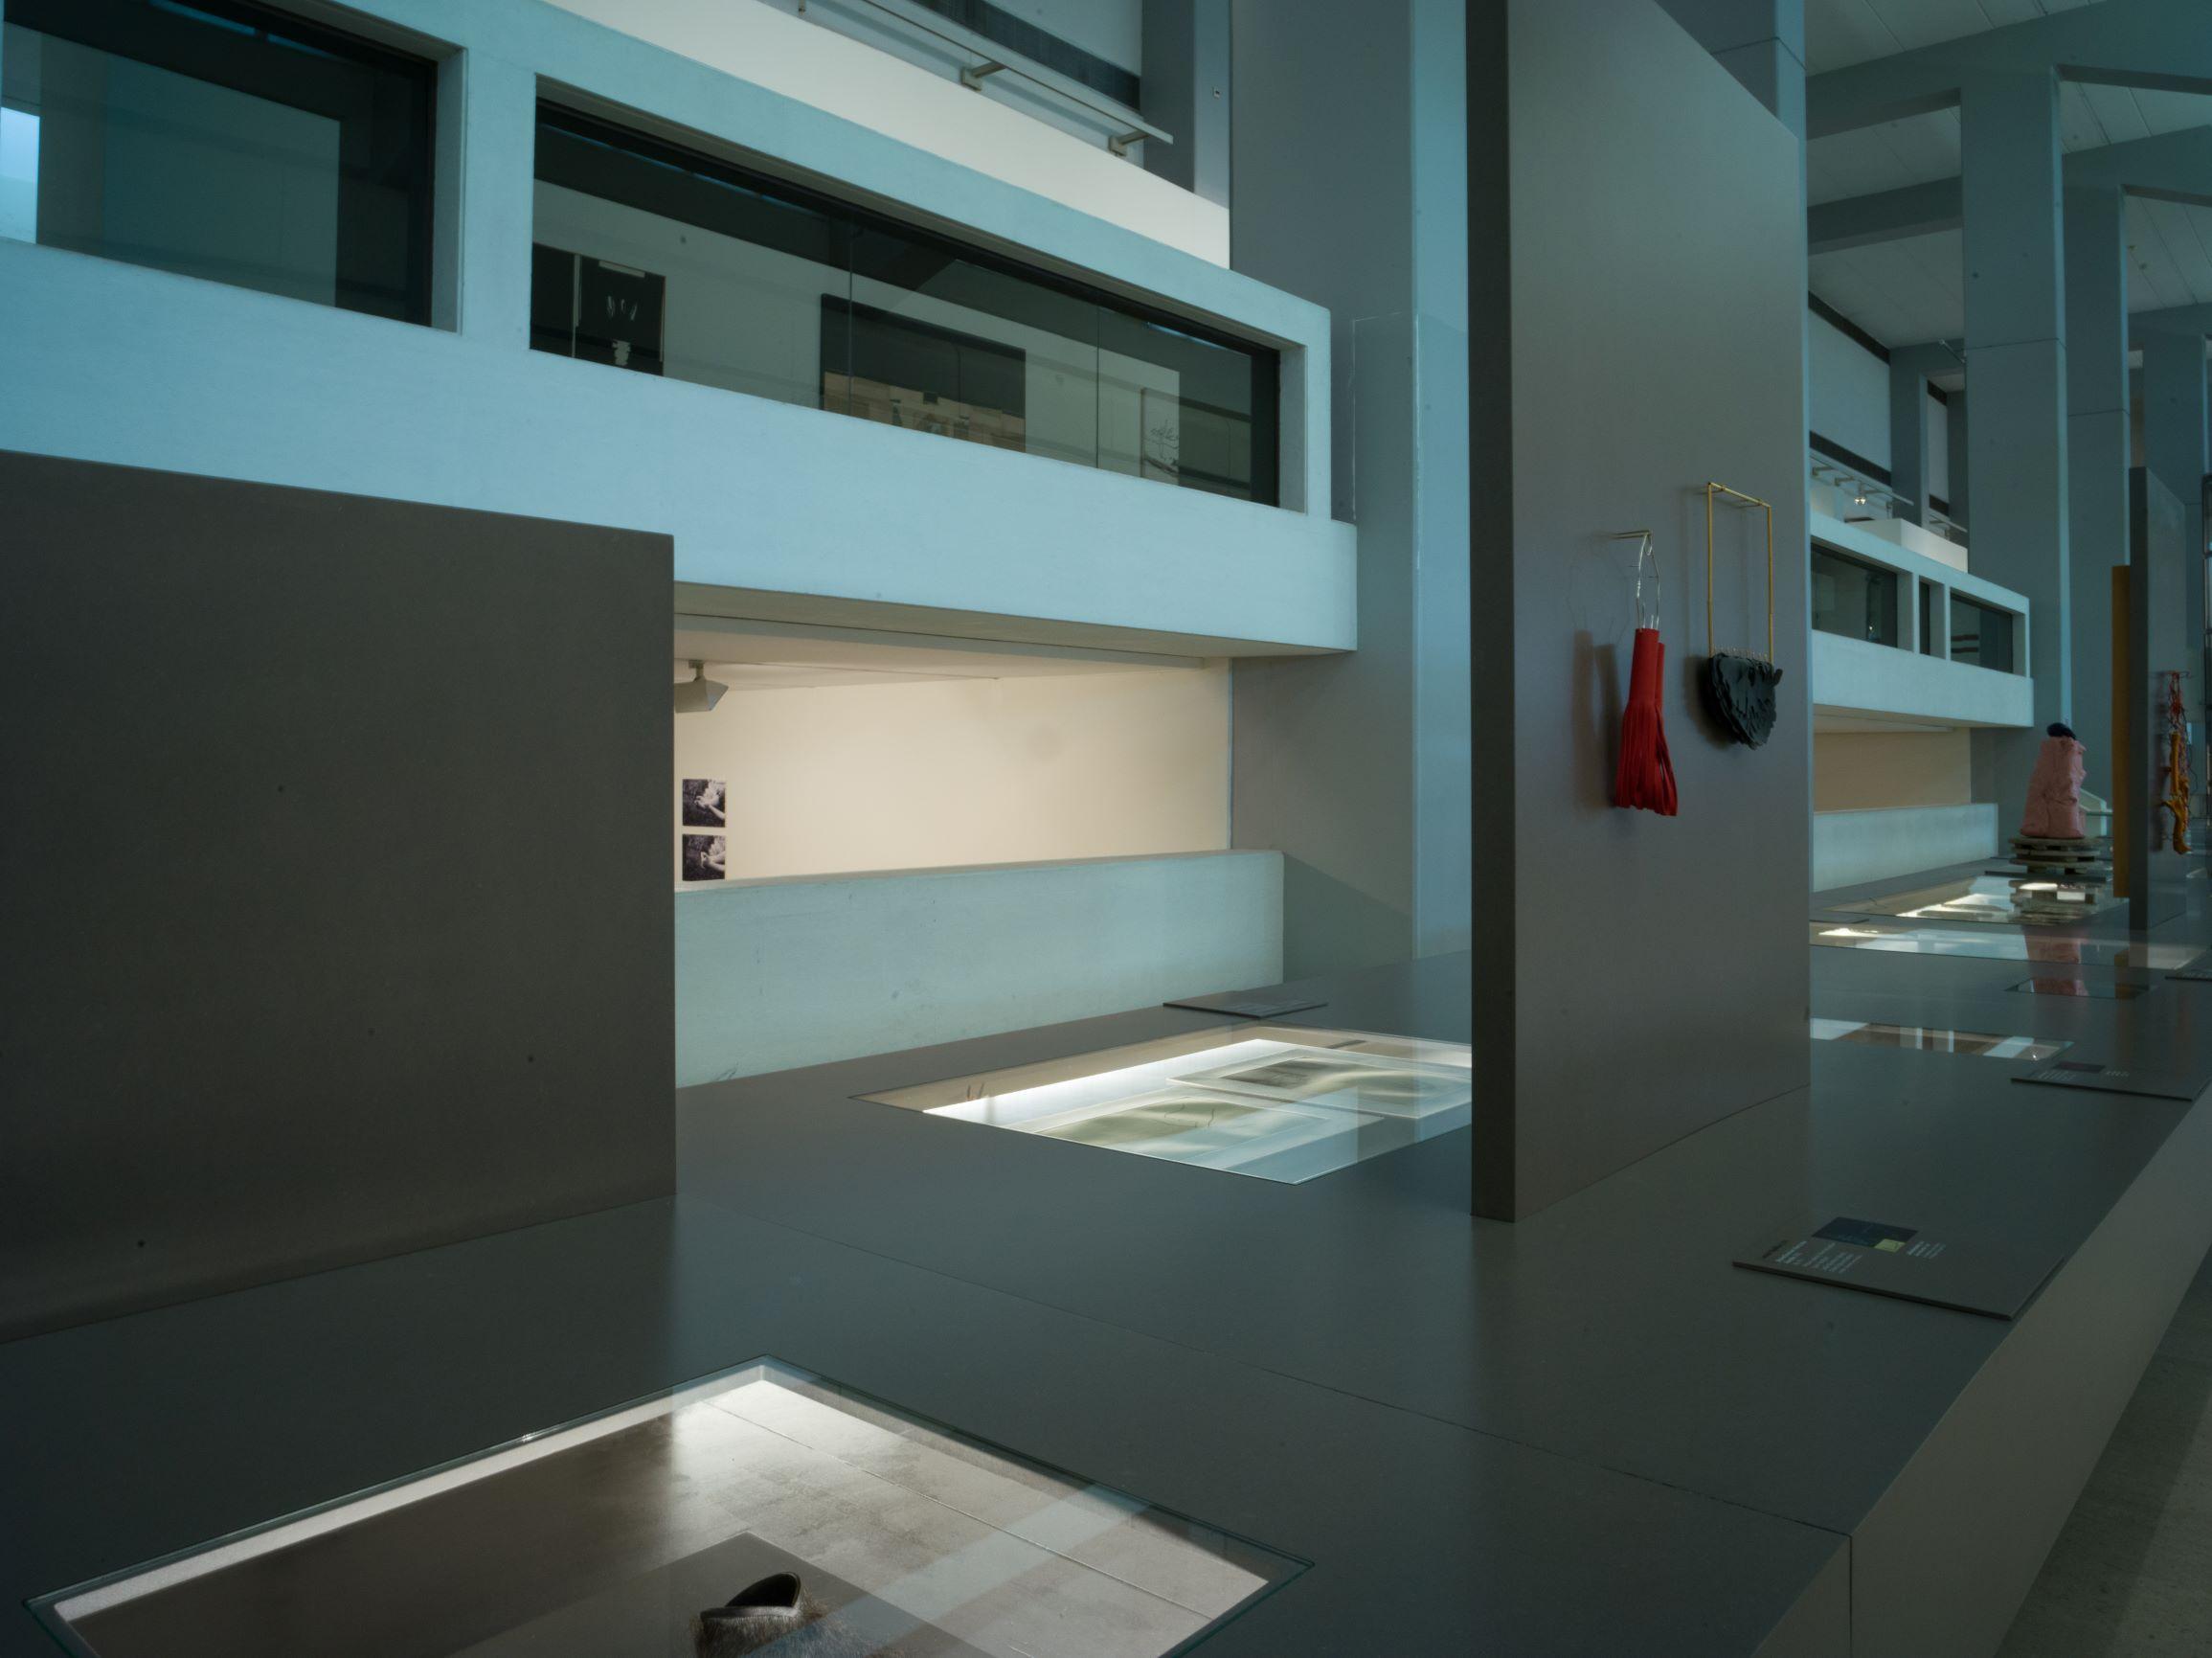 Contemporary Jewellery in Portugal/Joalharia Contemporânea em Portugal, 2019. Foto Catarina Gomes Ferreira, tentoonstelling